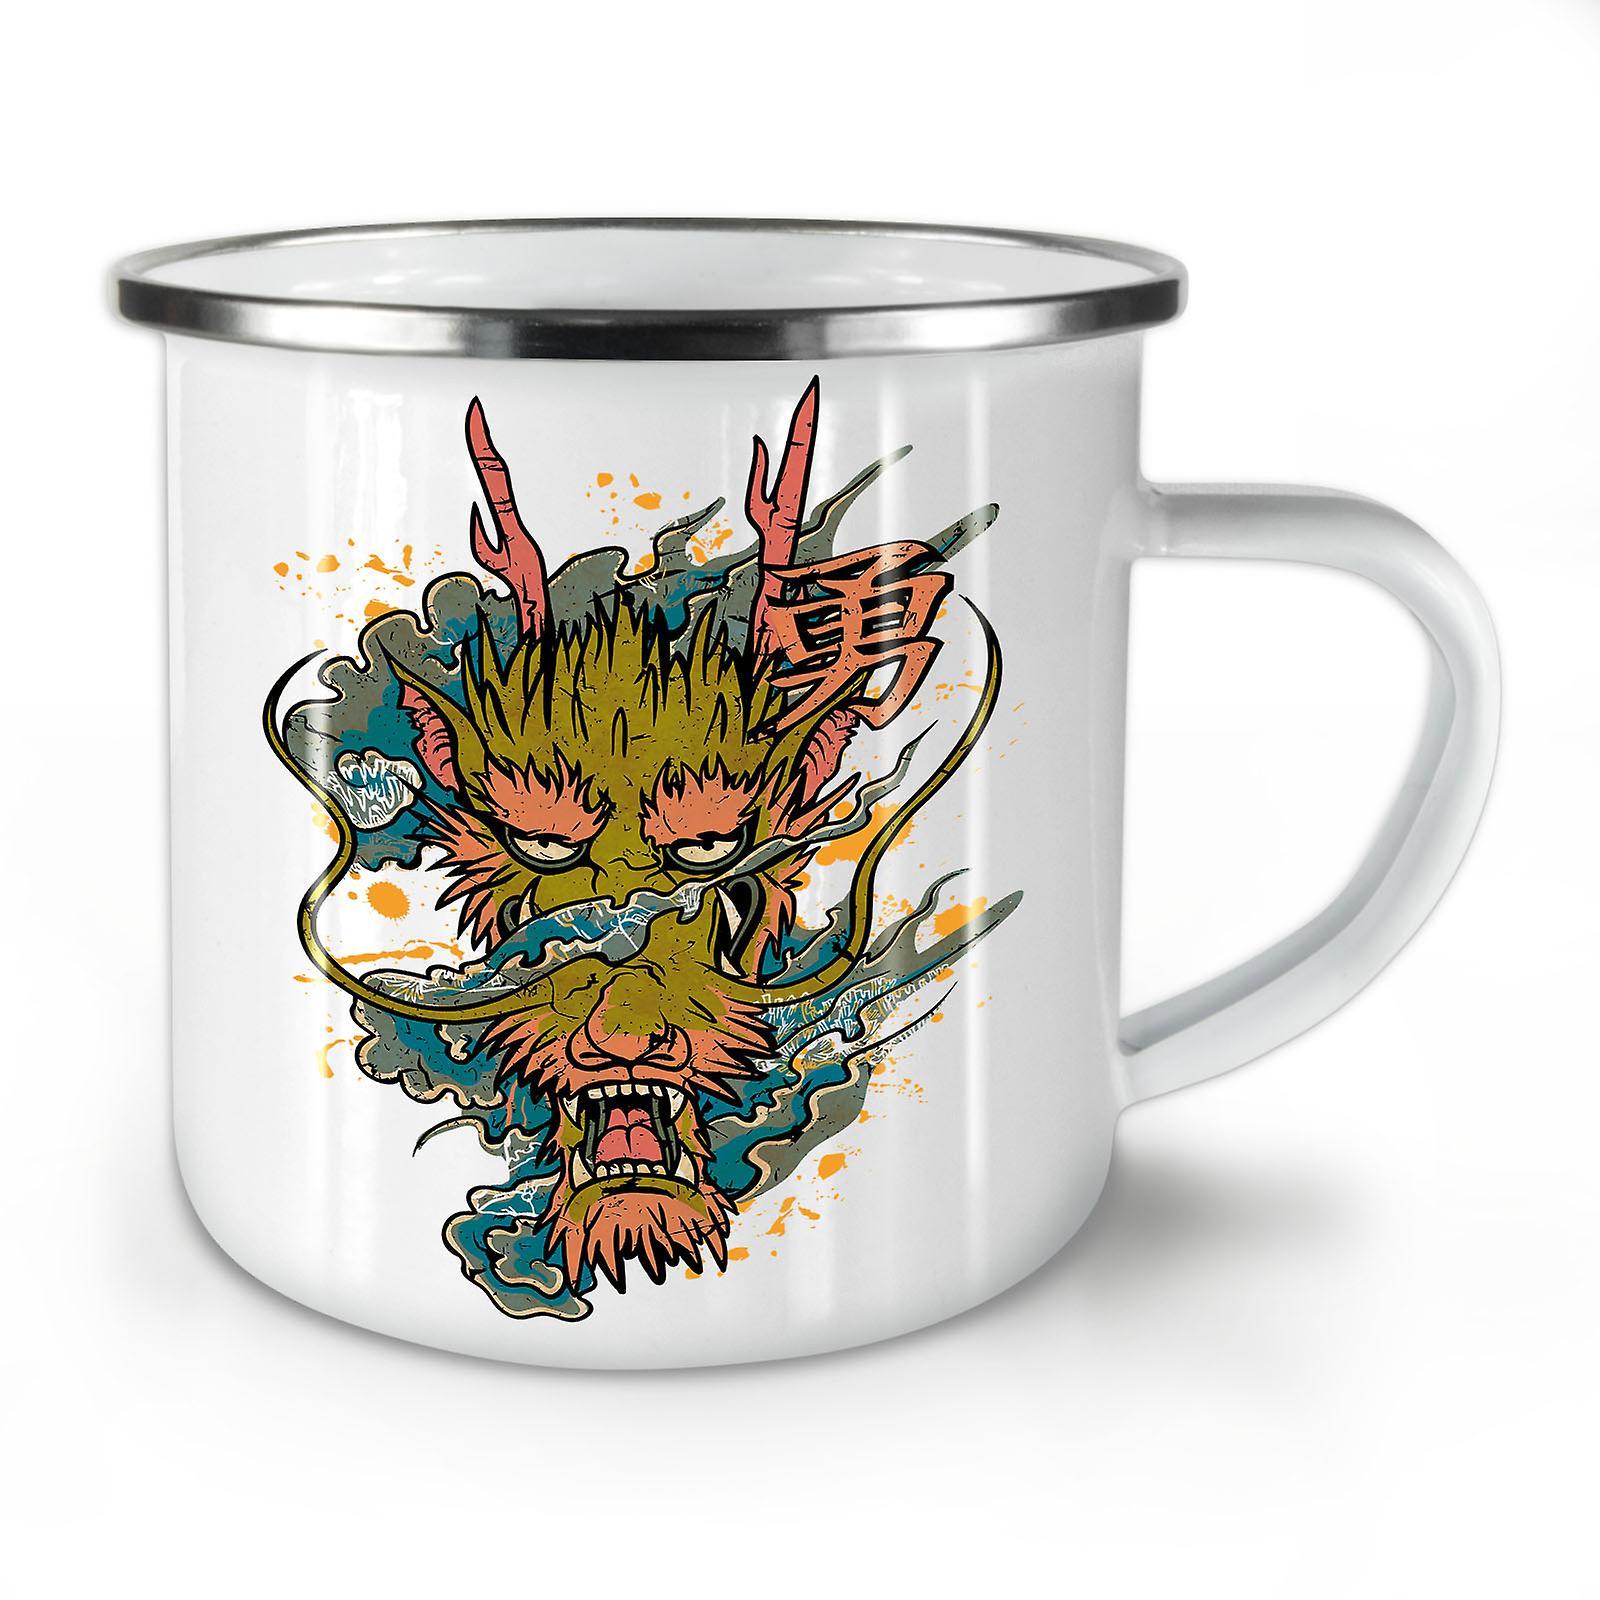 Nouveau Asiatique Mythe Dragon Mug10 Émail Whitetea OzWellcoda Café w0X8nONkZP